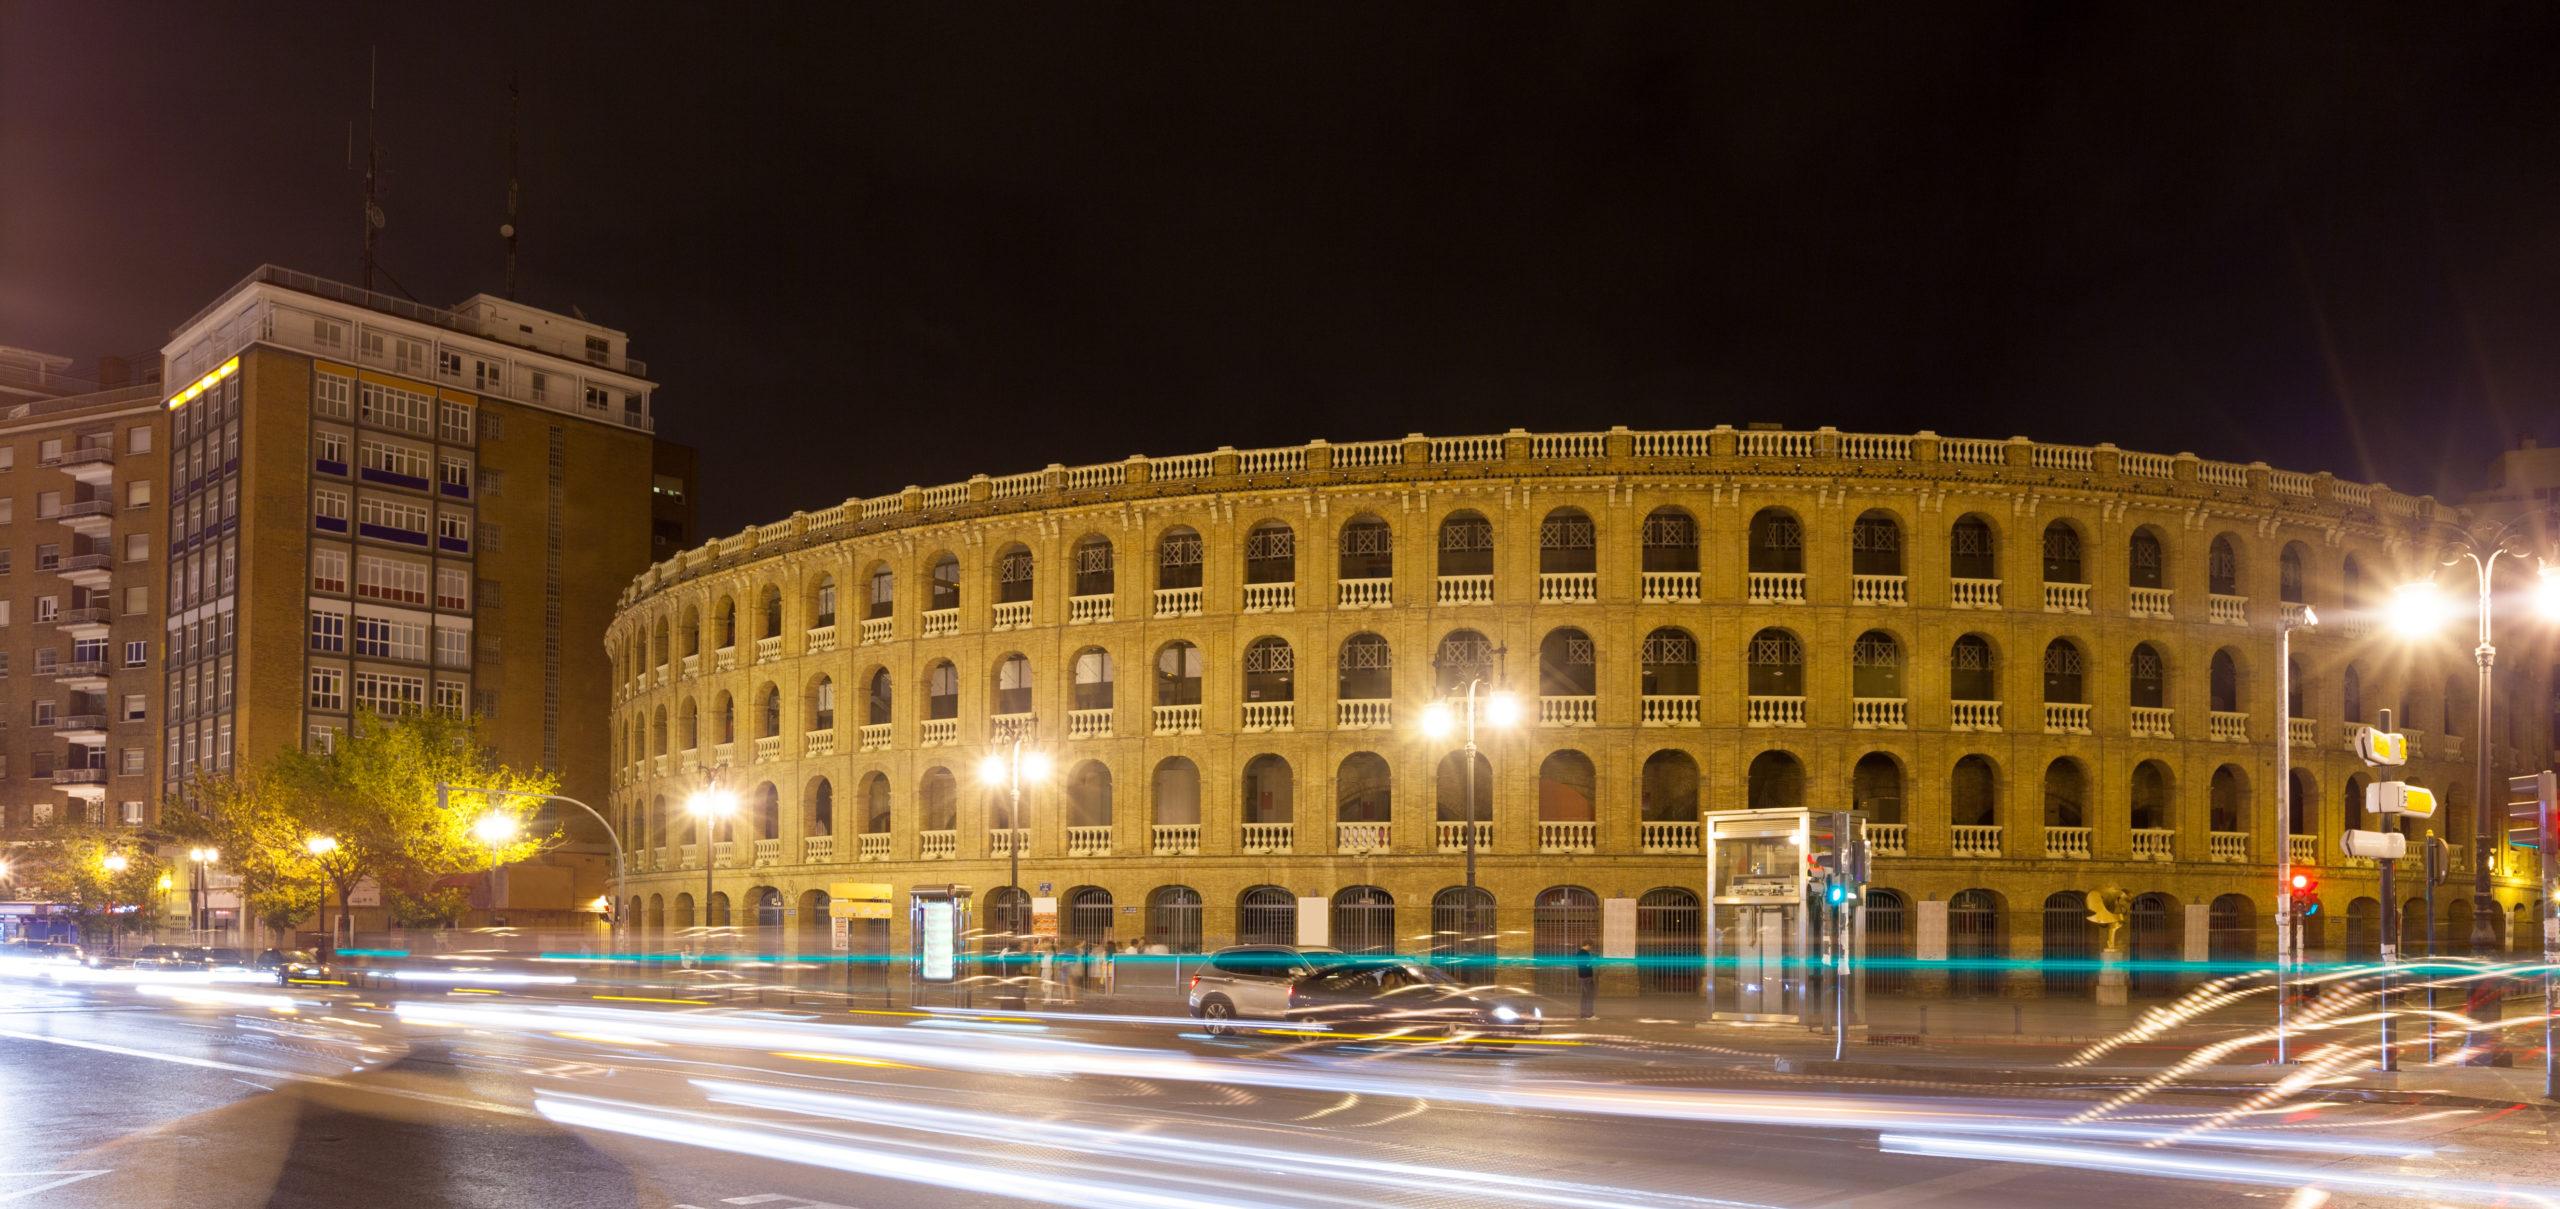 Plaza de toros in night time. Valencia